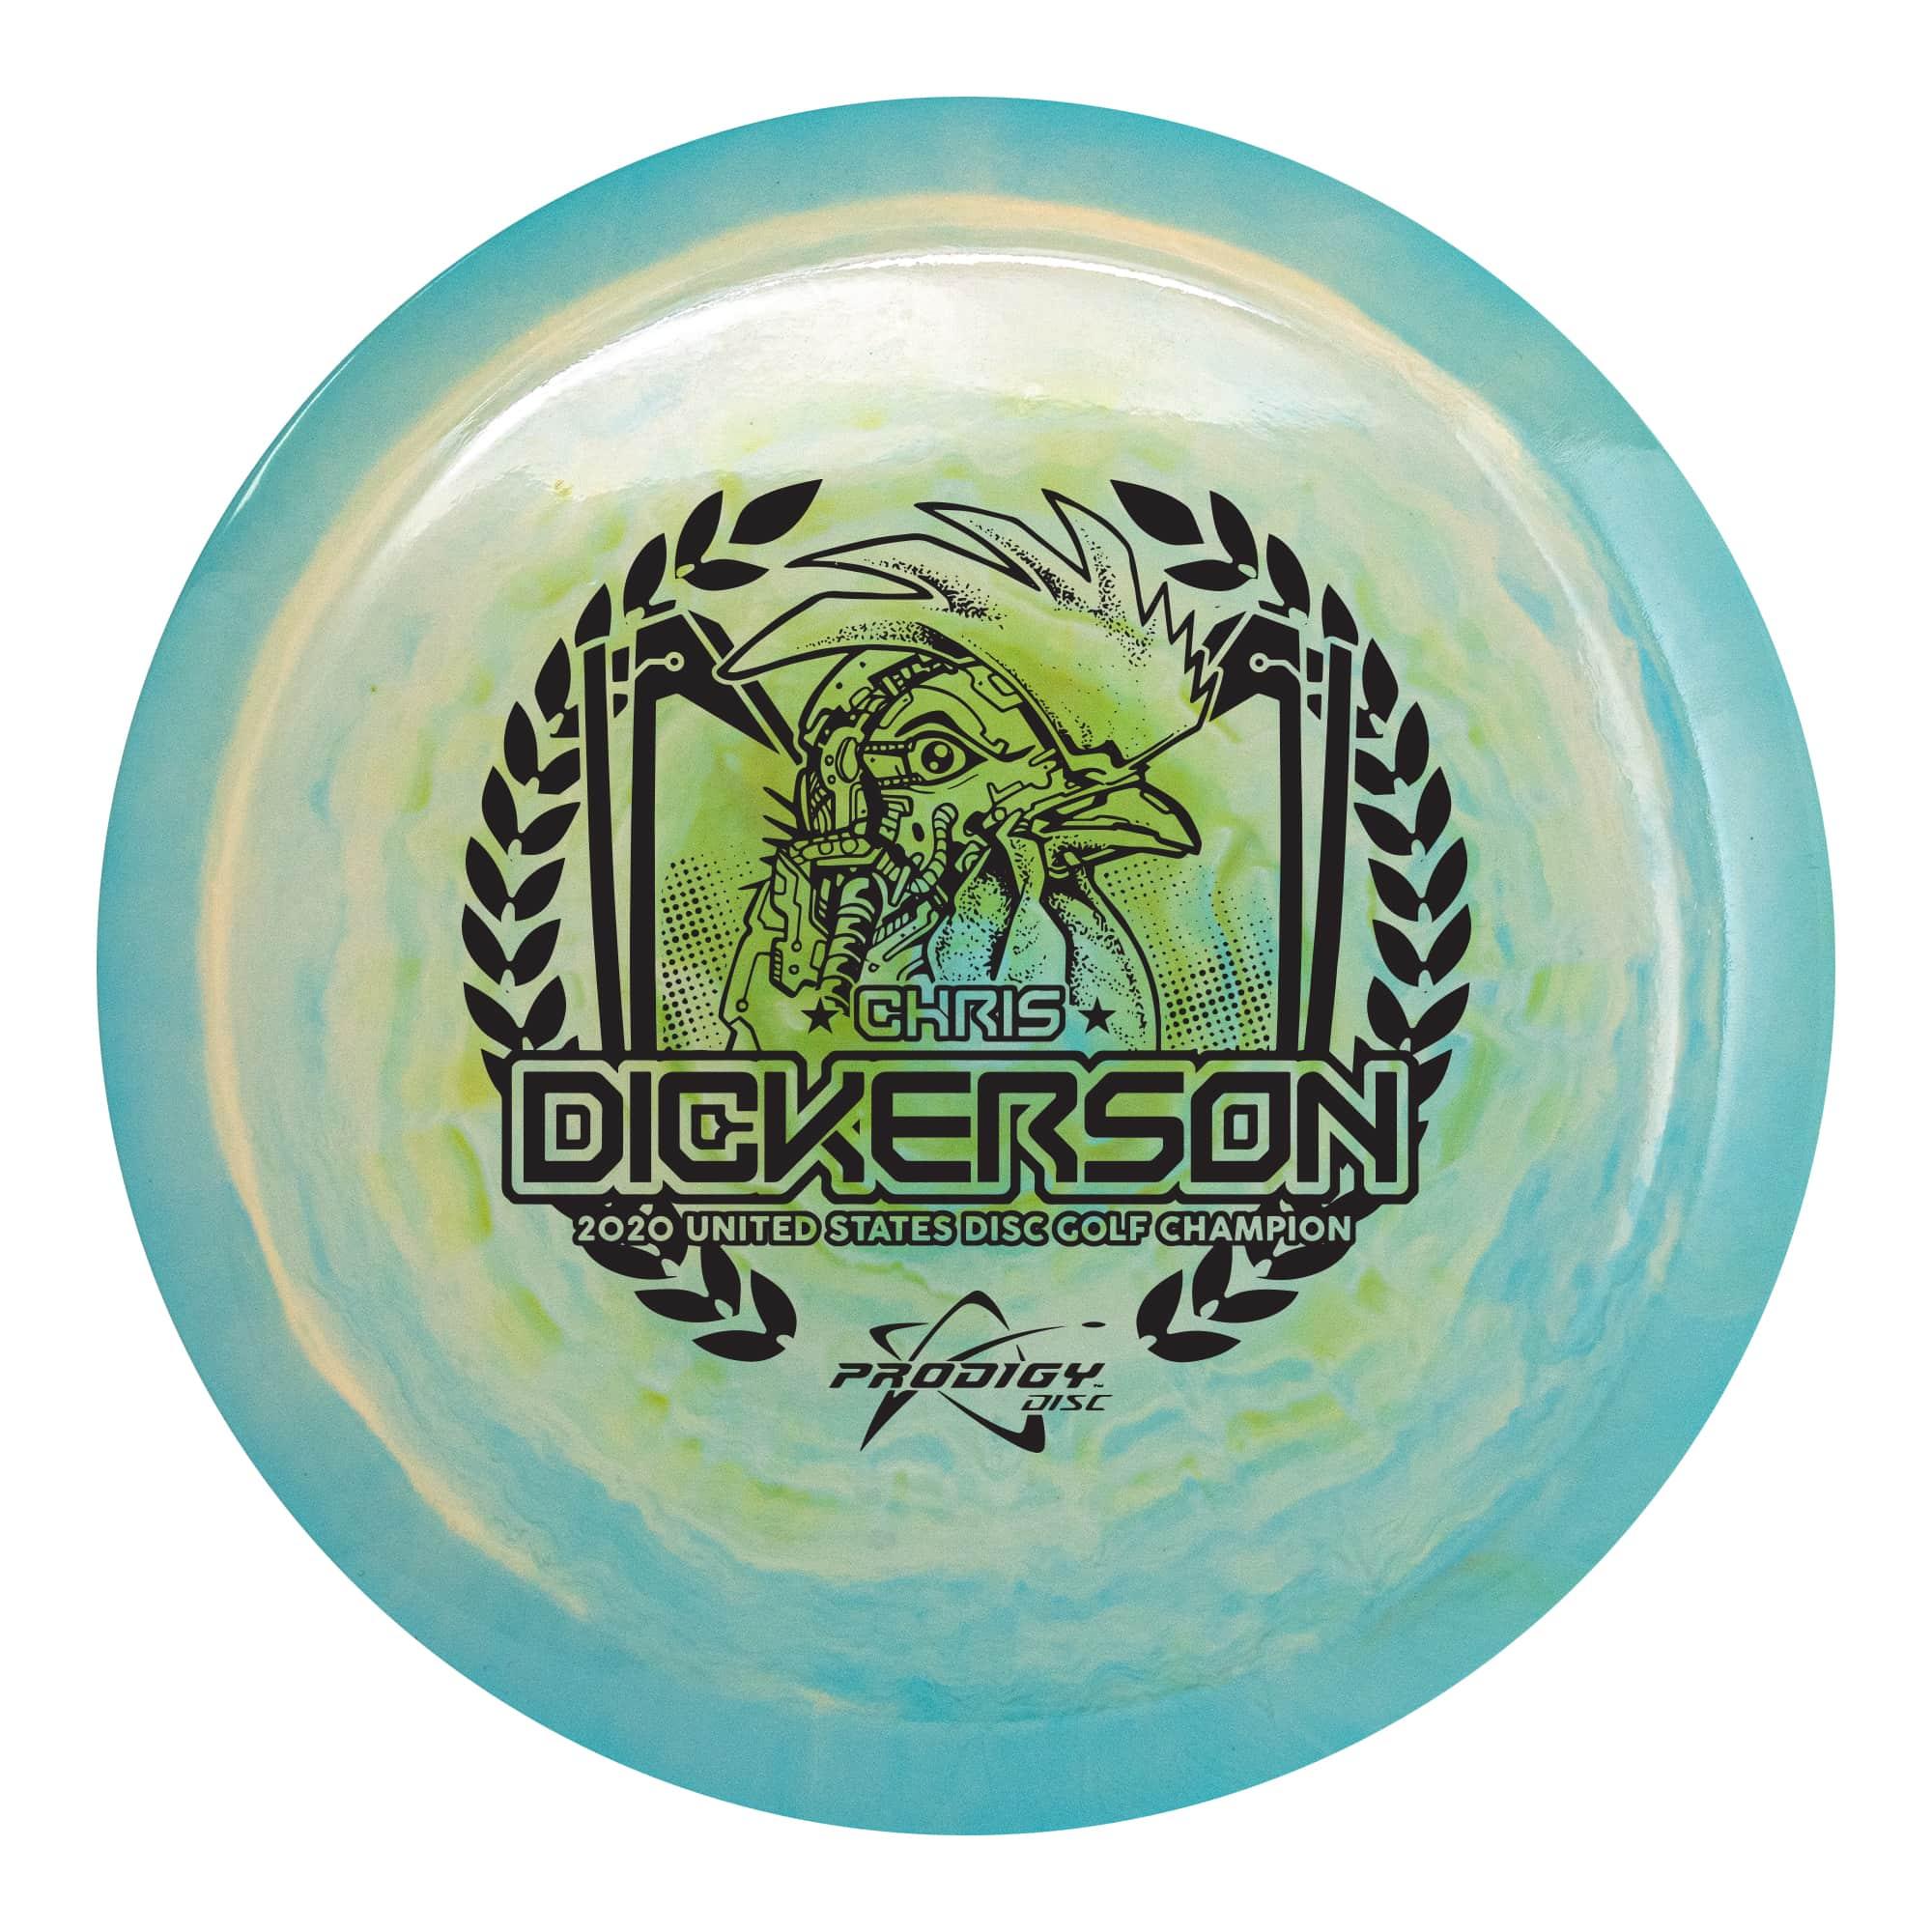 Prodigy 750 FX-2 Spectrum Chris Dickerson Signature Series